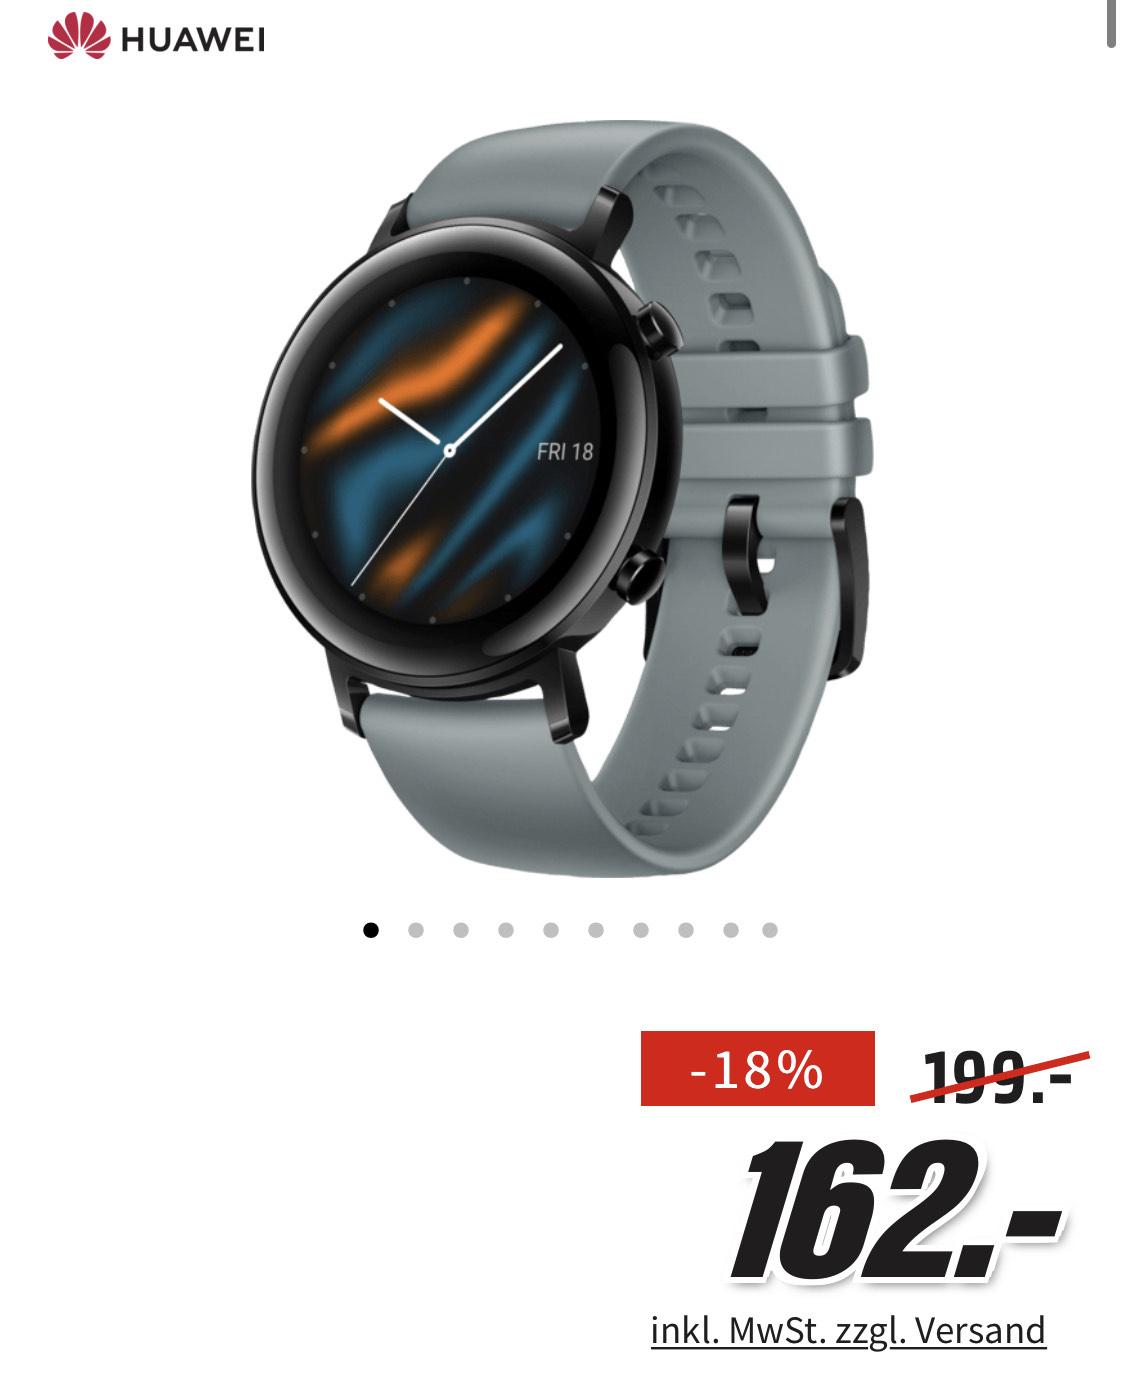 Media Markt - HUAWEI Watch GT 2 42mm Sport Smartwatch, Fluorkautschuk, 130-200 mm, Blaugrau